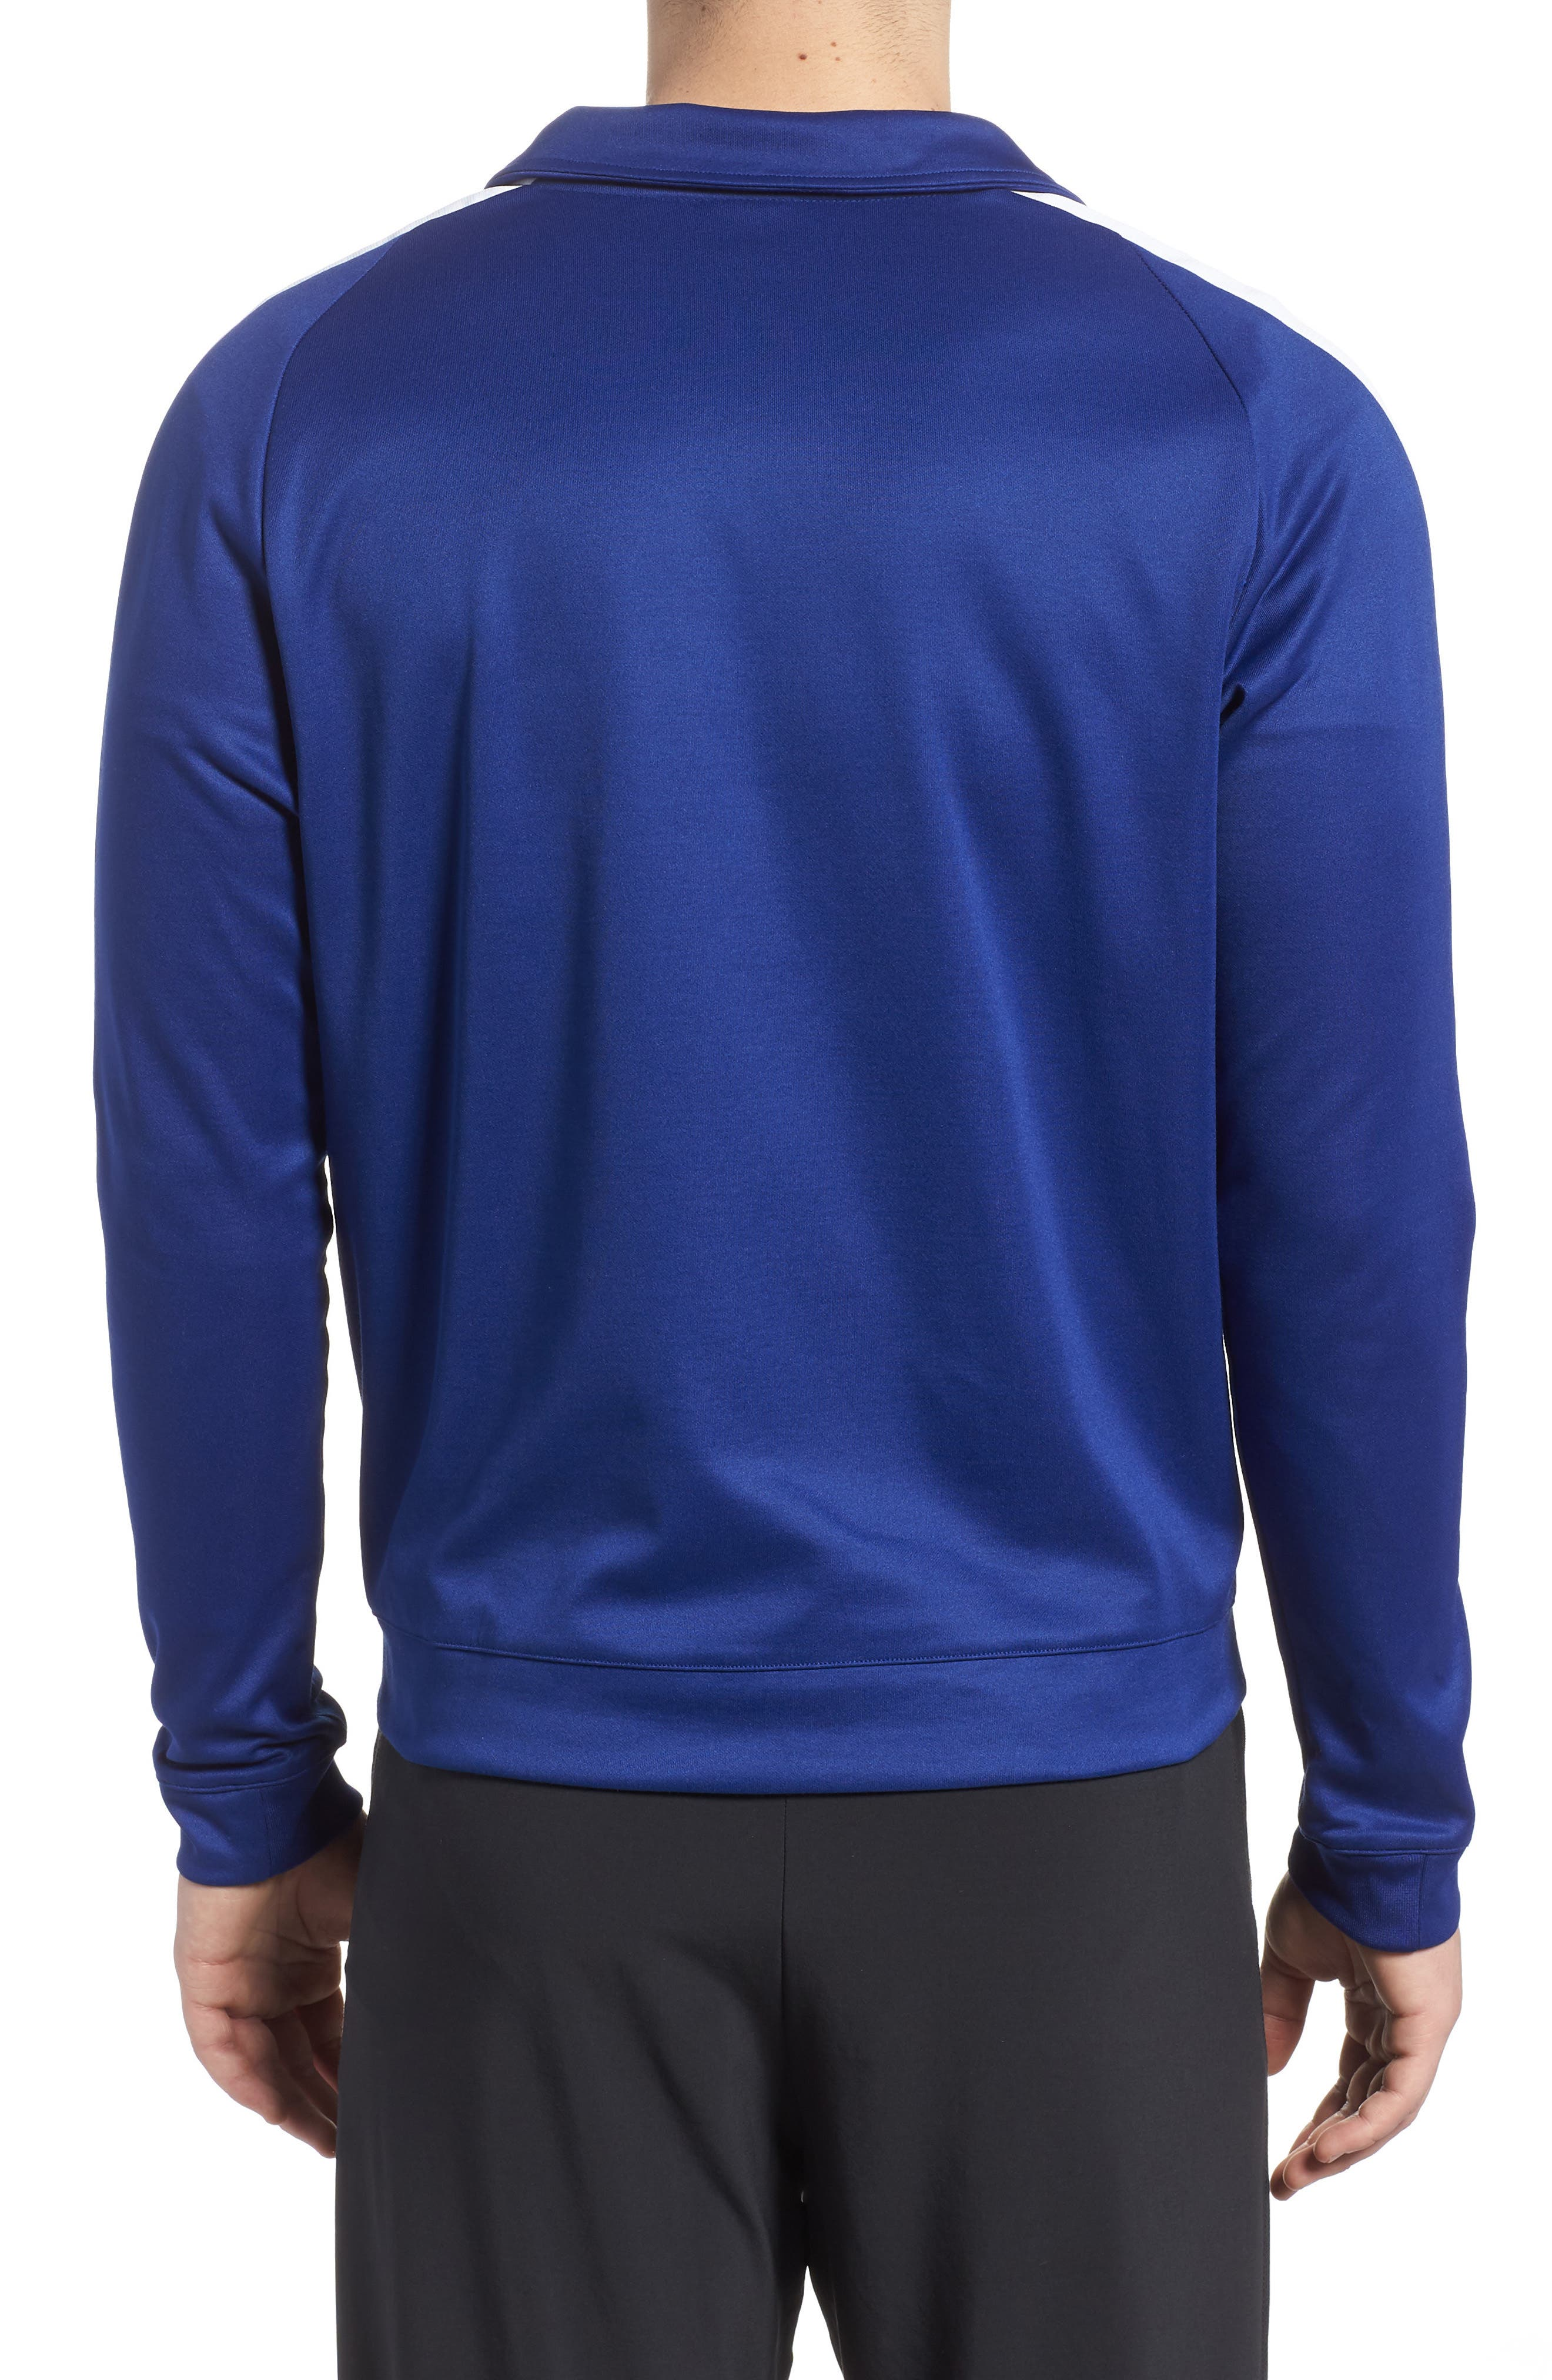 Sportswear Zip Track Jacket,                             Alternate thumbnail 2, color,                             Deep Royal Blue/ White/ Black